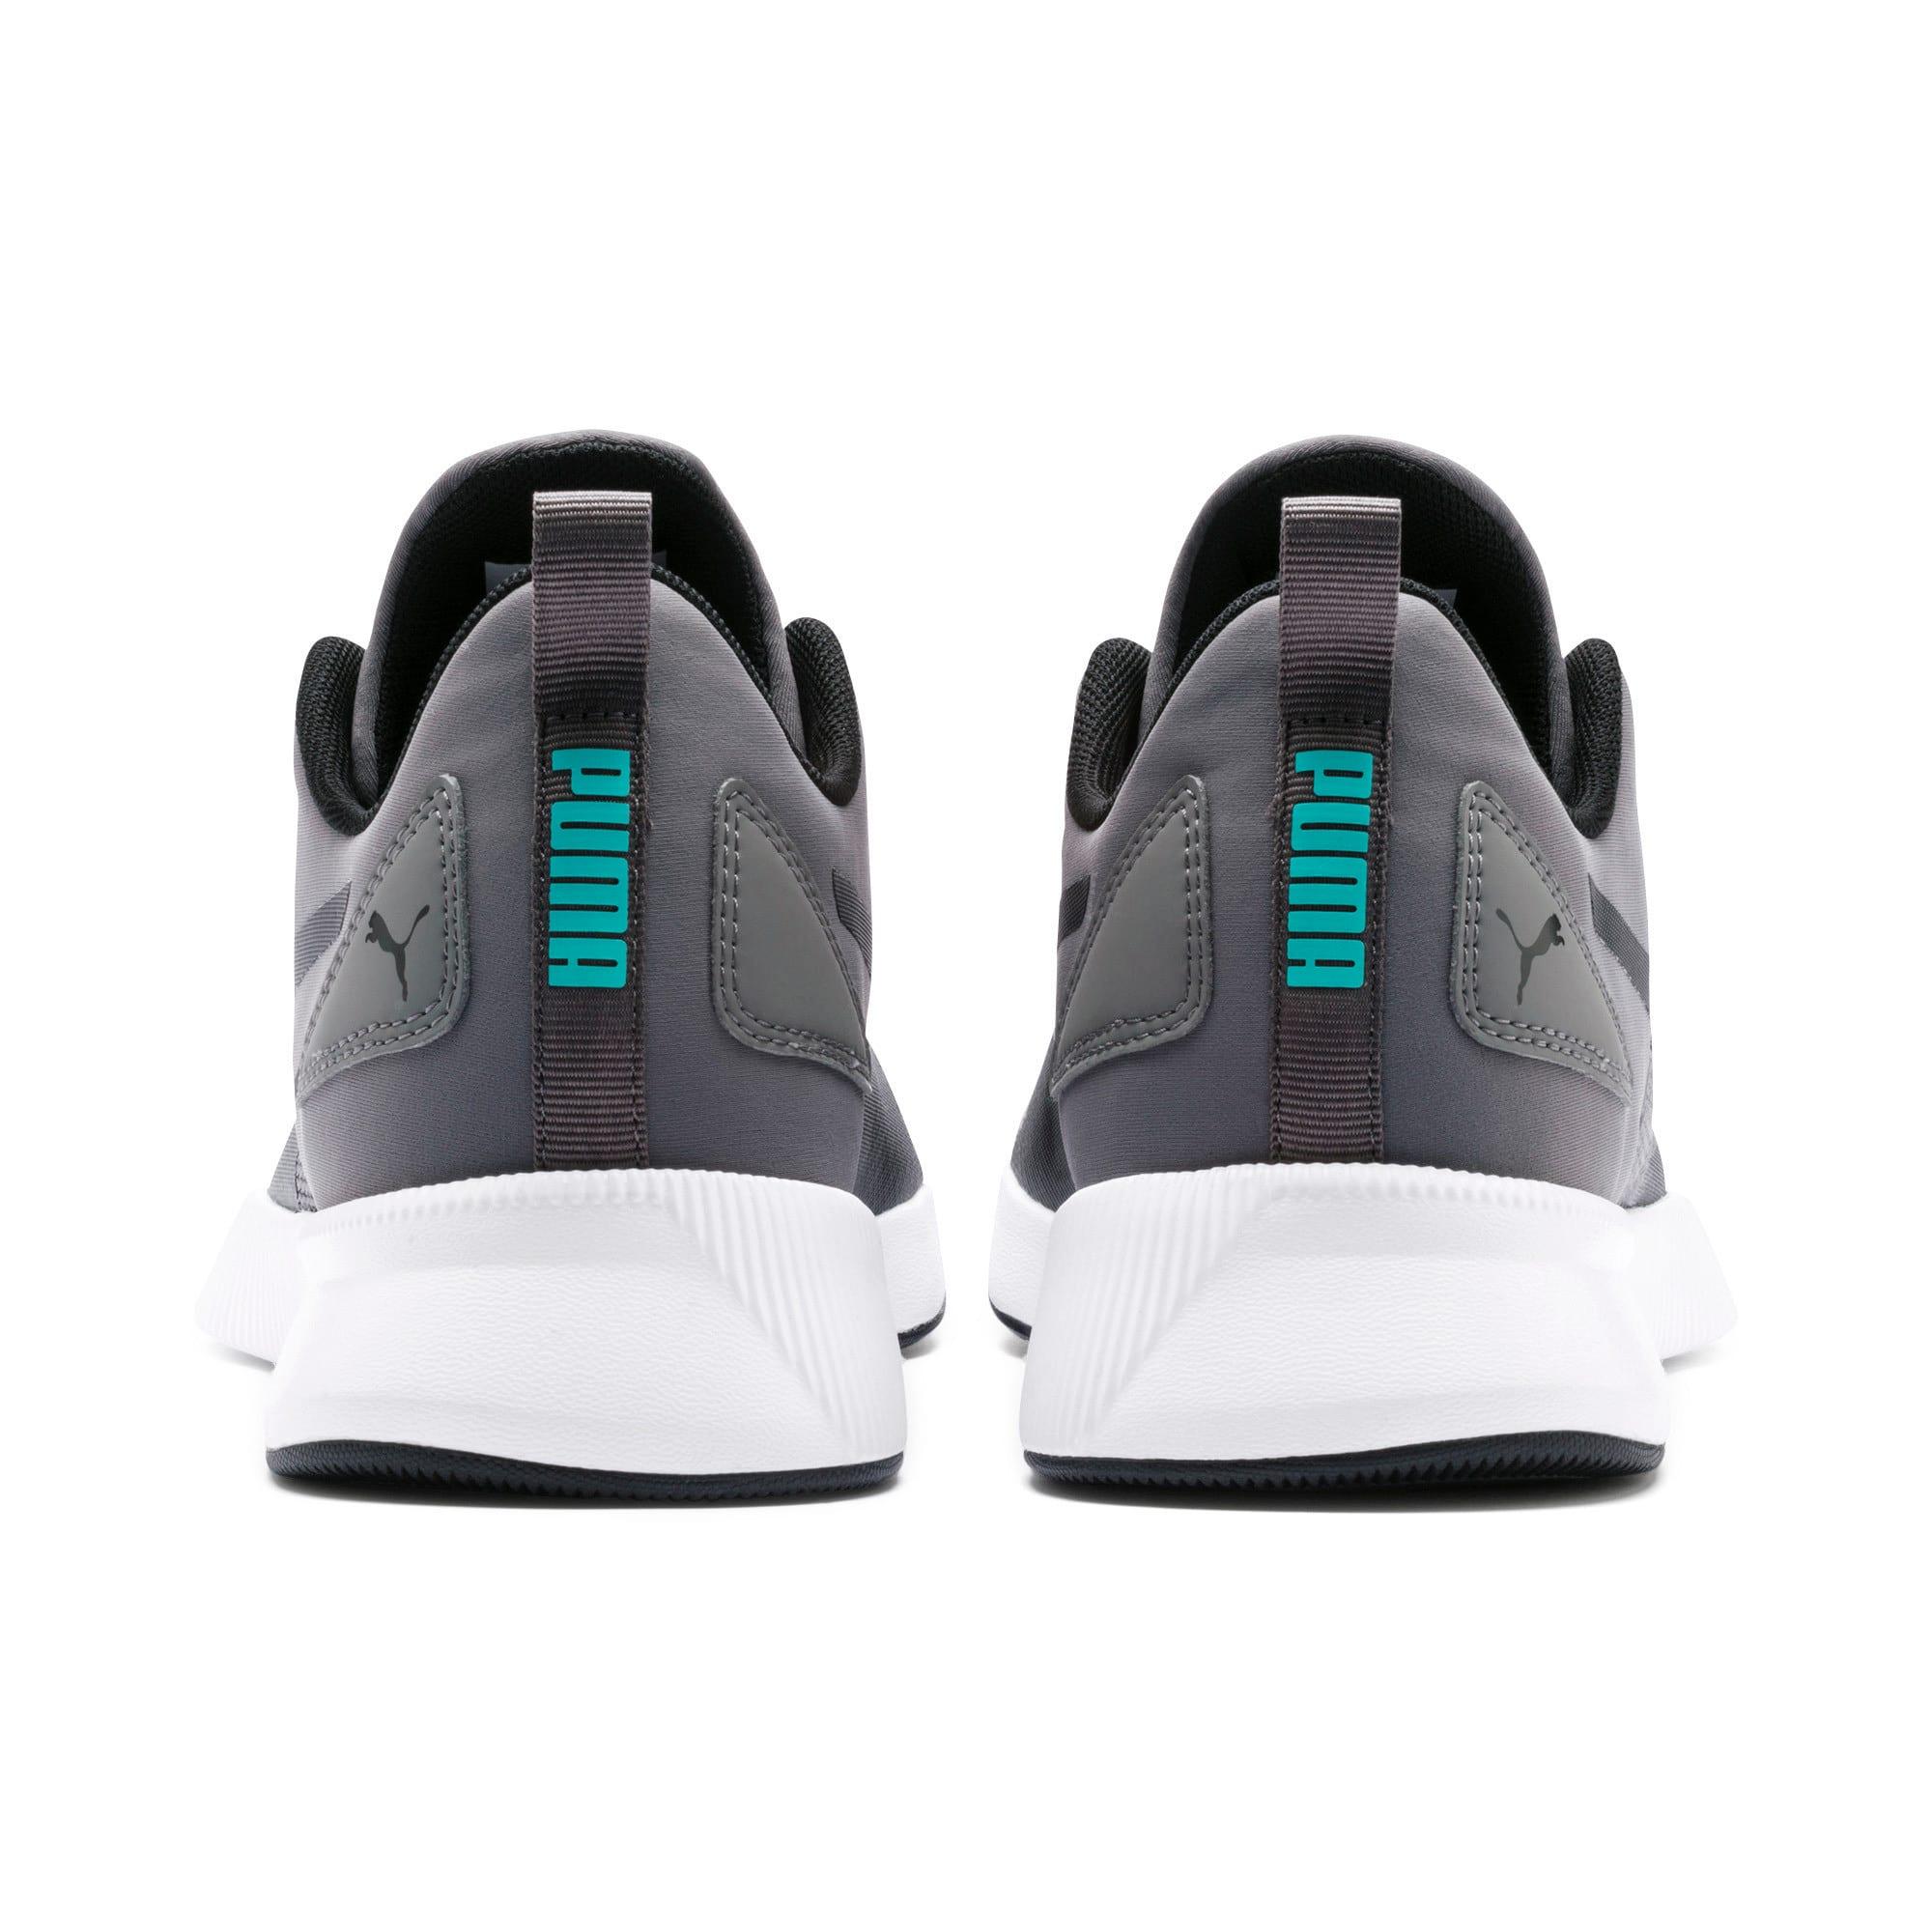 Thumbnail 5 of Flyer Runner Running Shoes, Charcoal-Black-Turquoise, medium